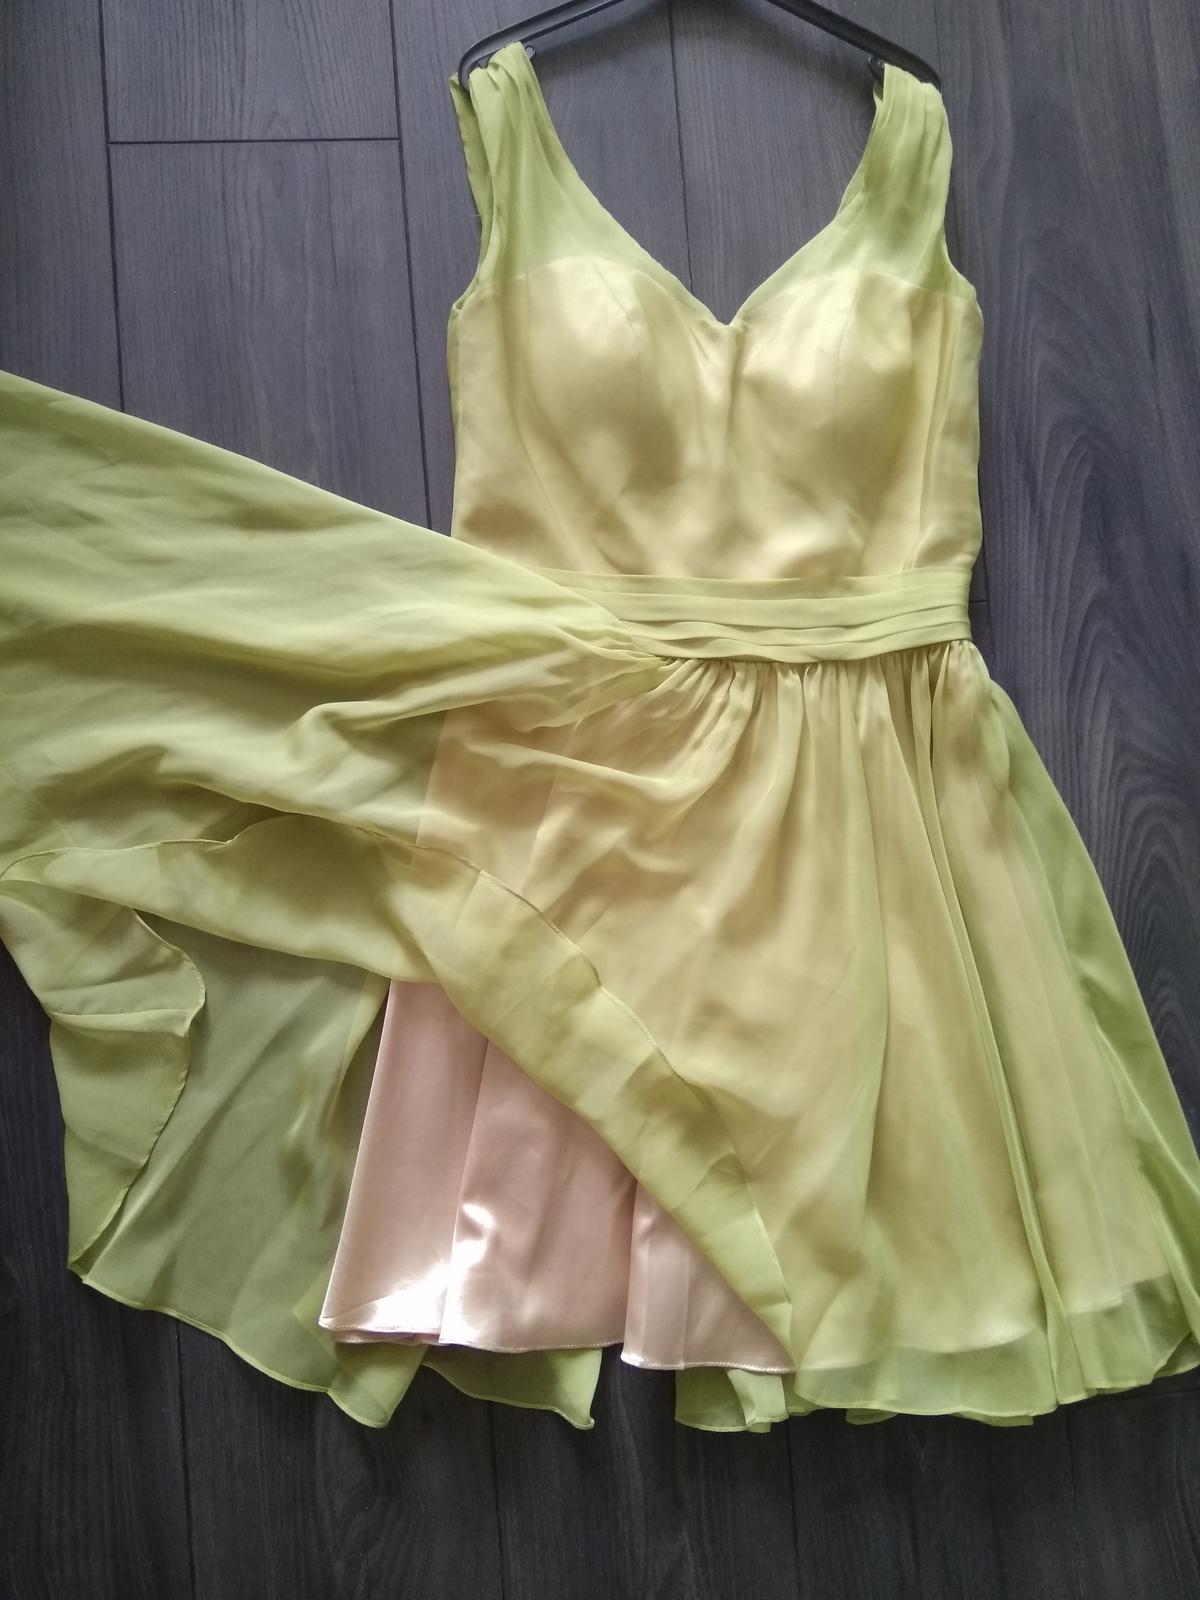 Spoločenské šaty - krátke - Obrázok č. 1